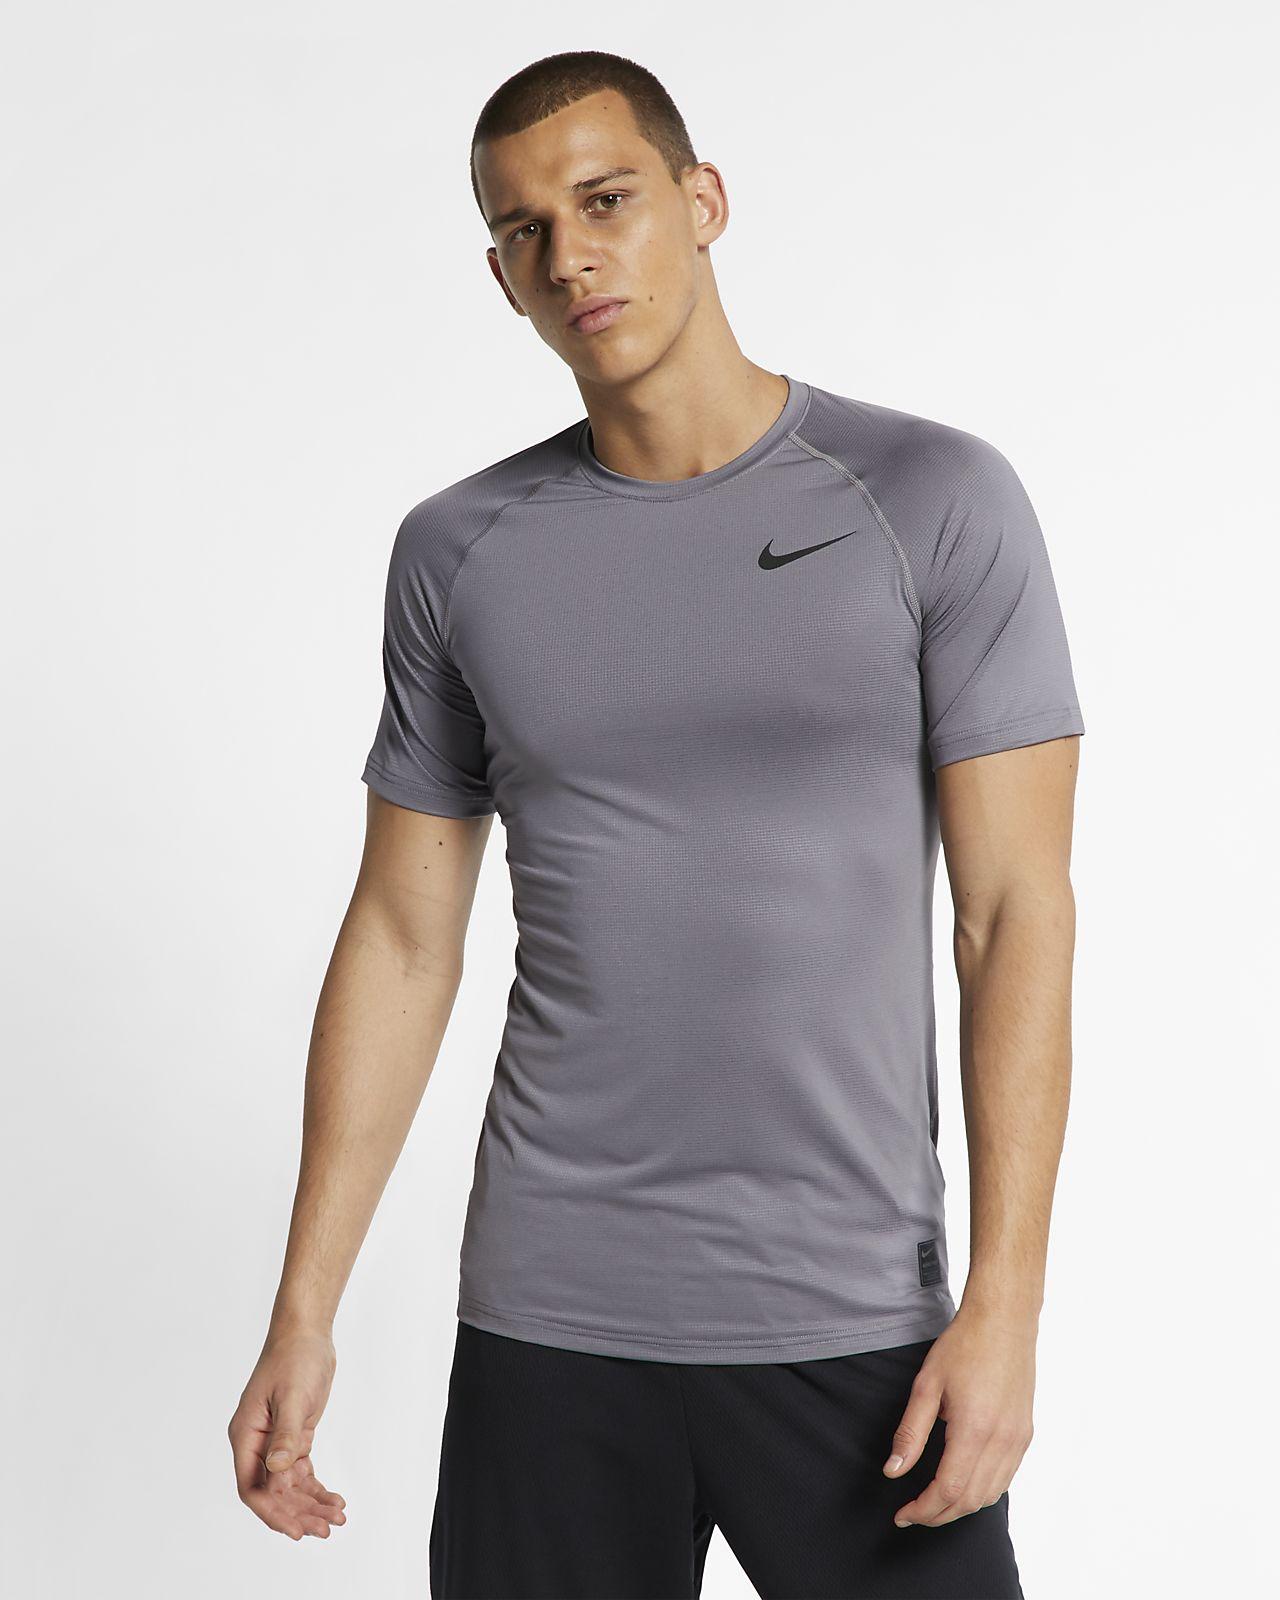 Nike Breathe Pro 男款短袖上衣